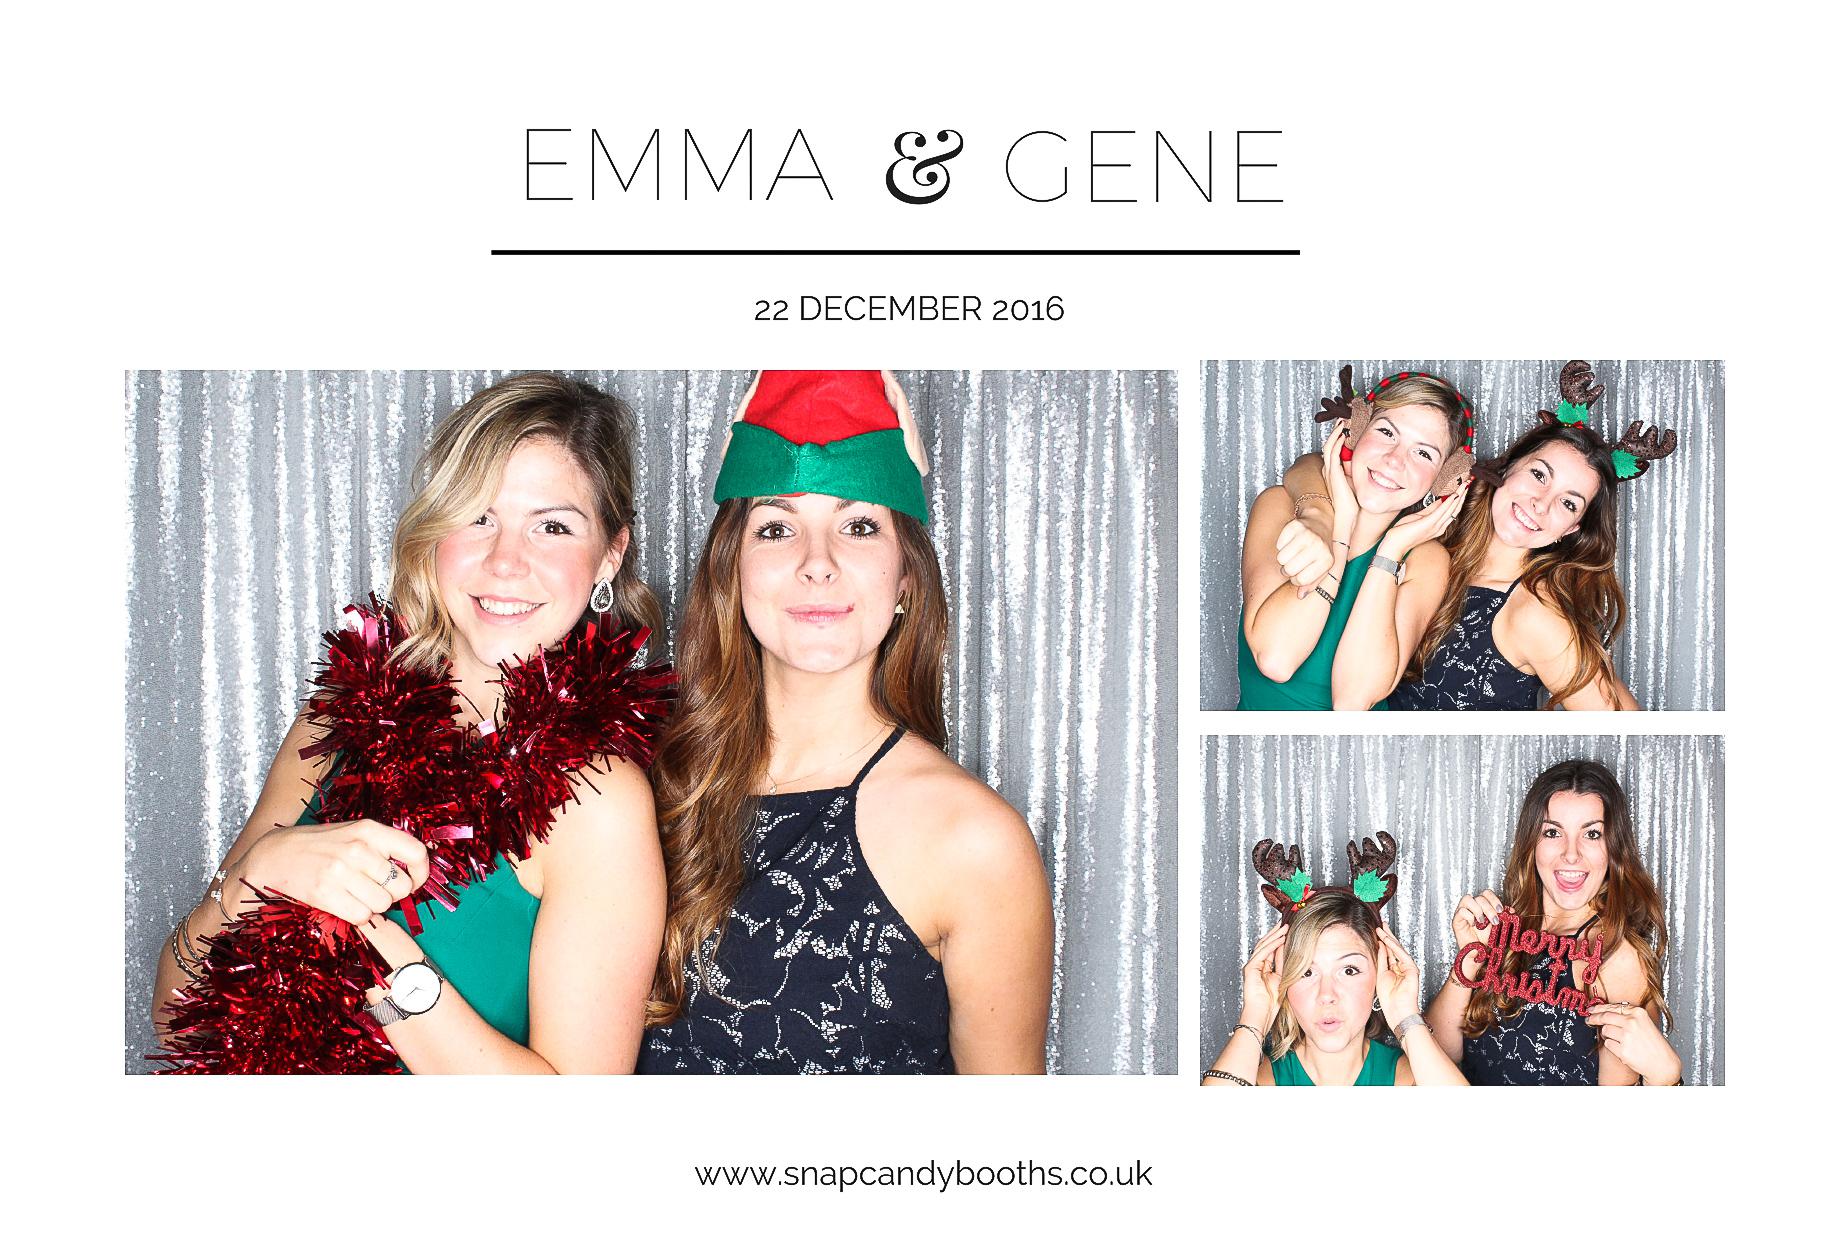 emma-gene-221216-multi-003